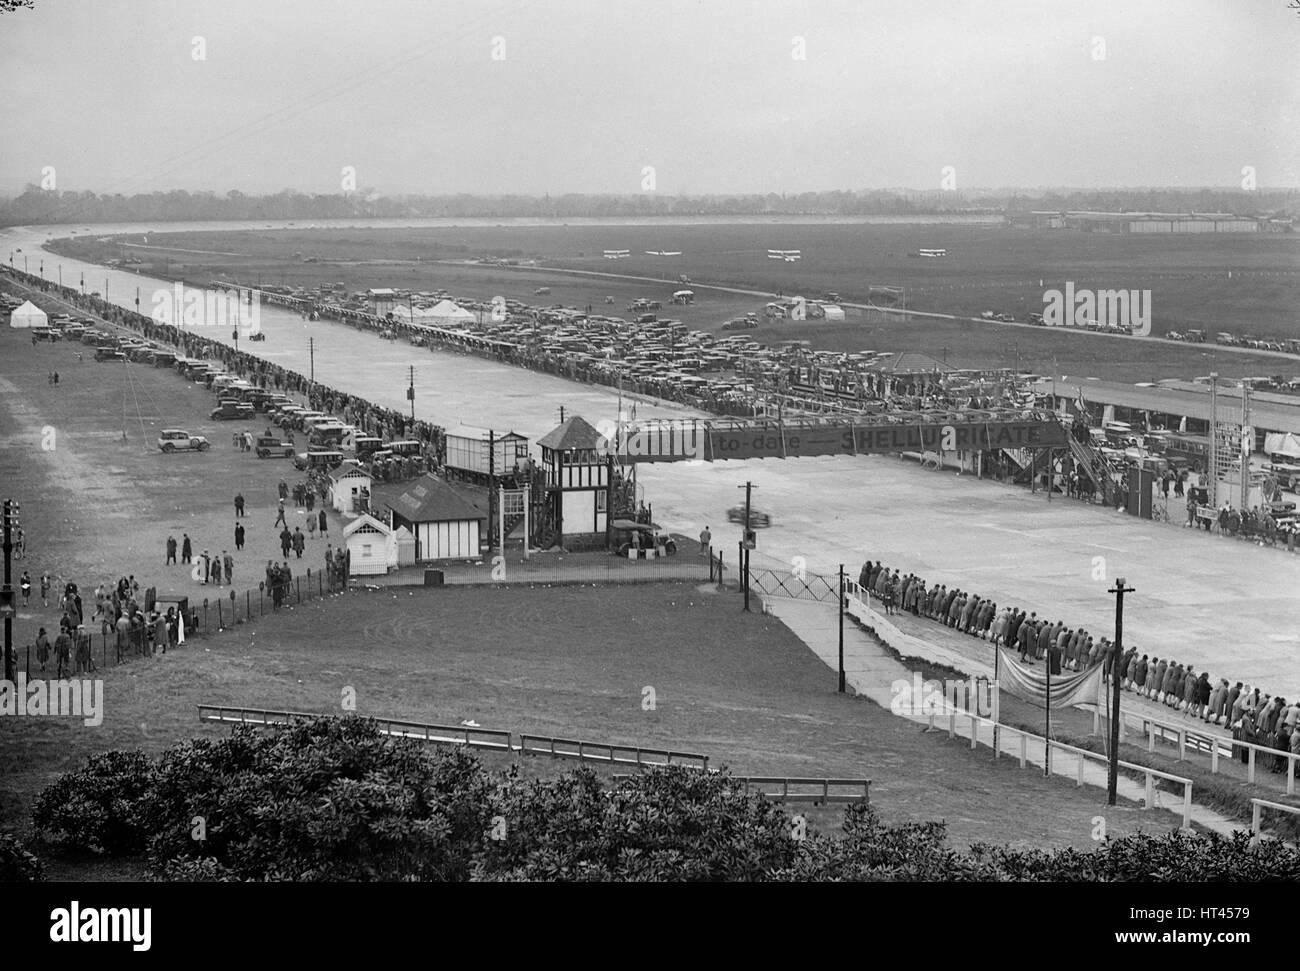 JCC Double Twelve Race, Brooklands, Surrey, 1929. Artist: Bill Brunell. - Stock Image